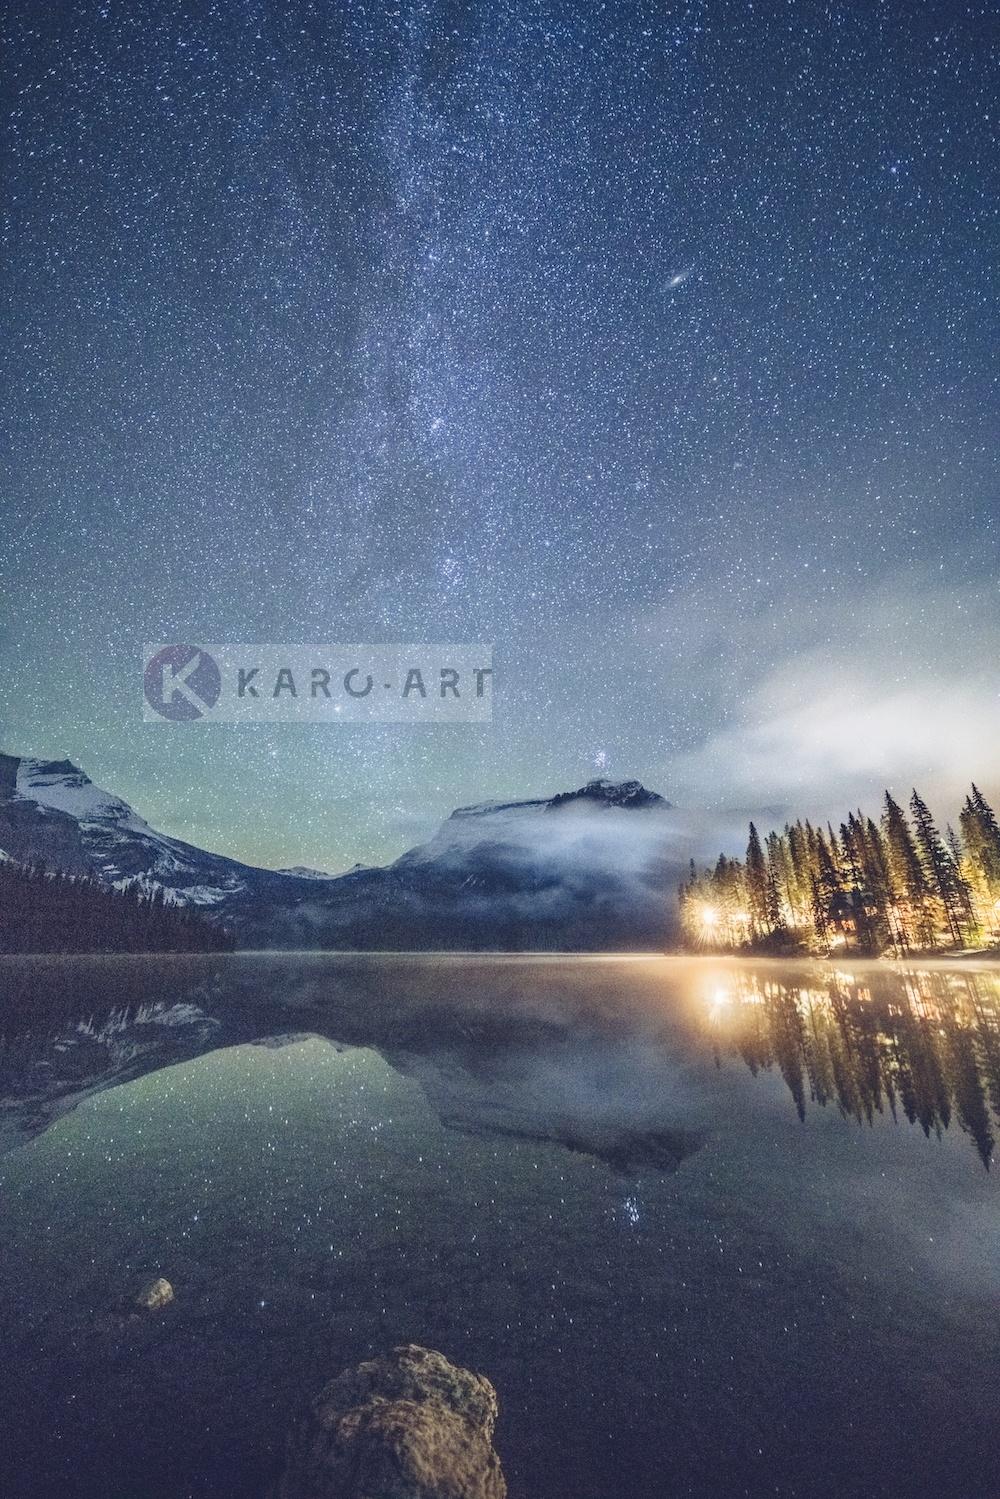 Afbeelding op acrylglas - Emerald Lake, Melkweg